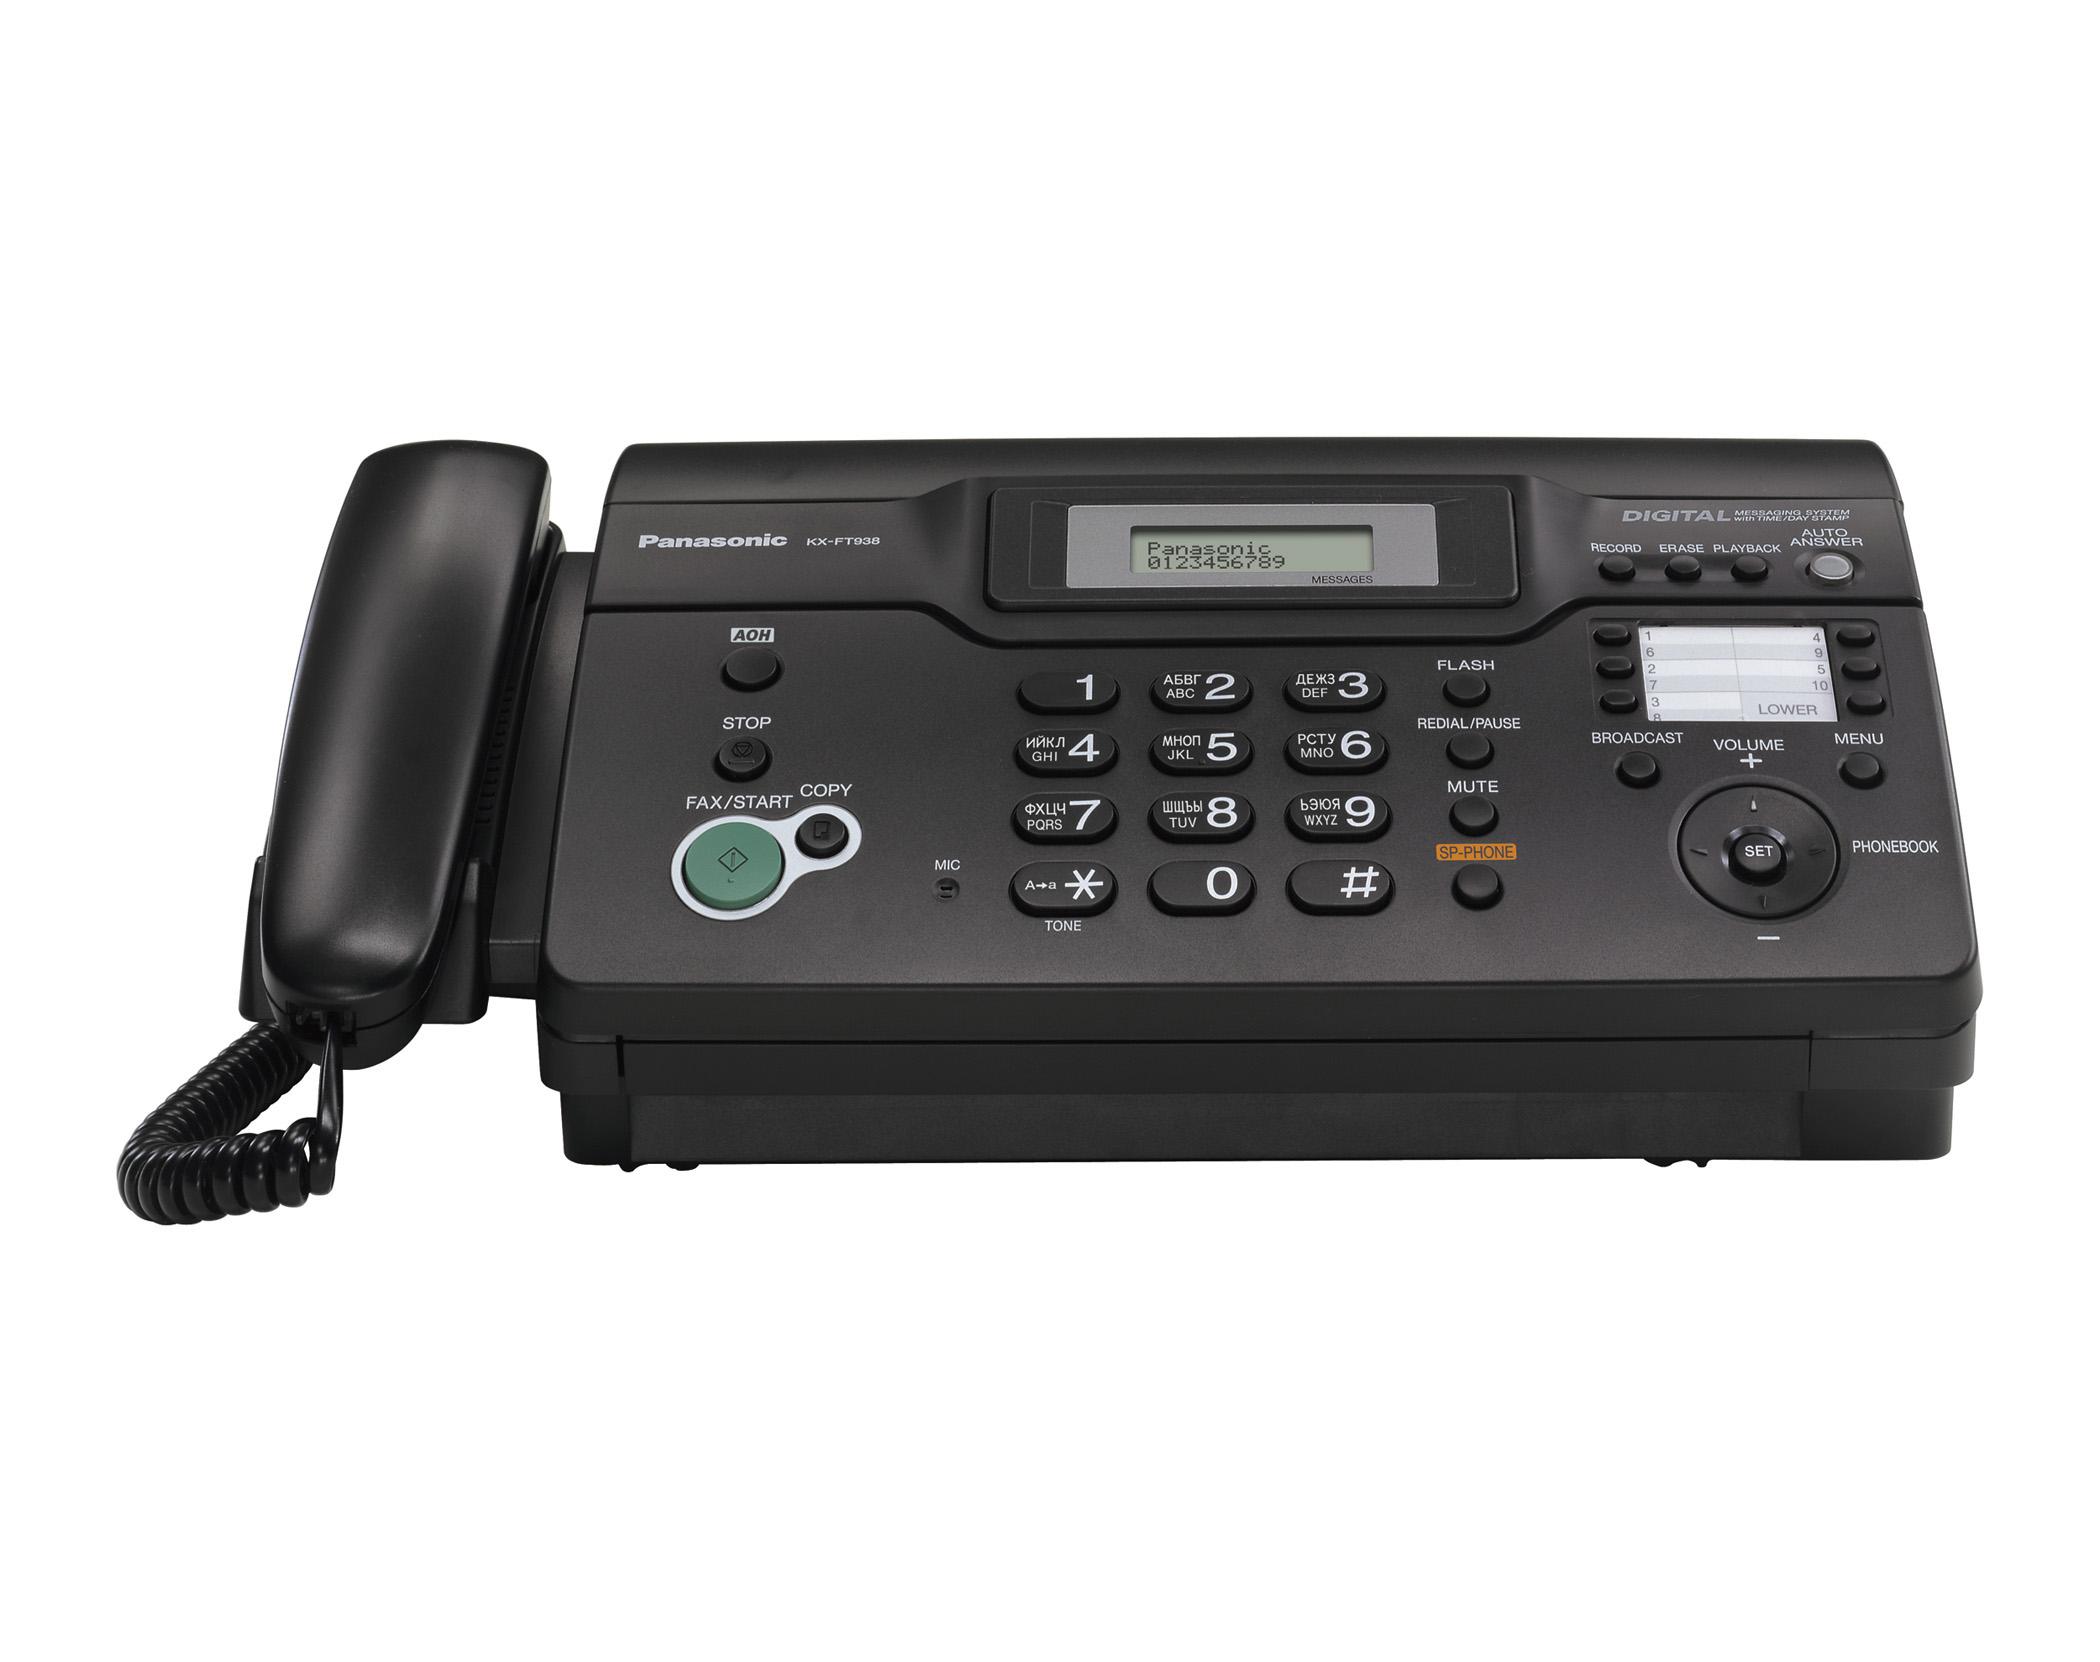 Инструкция к факсу panasonic kx ft938